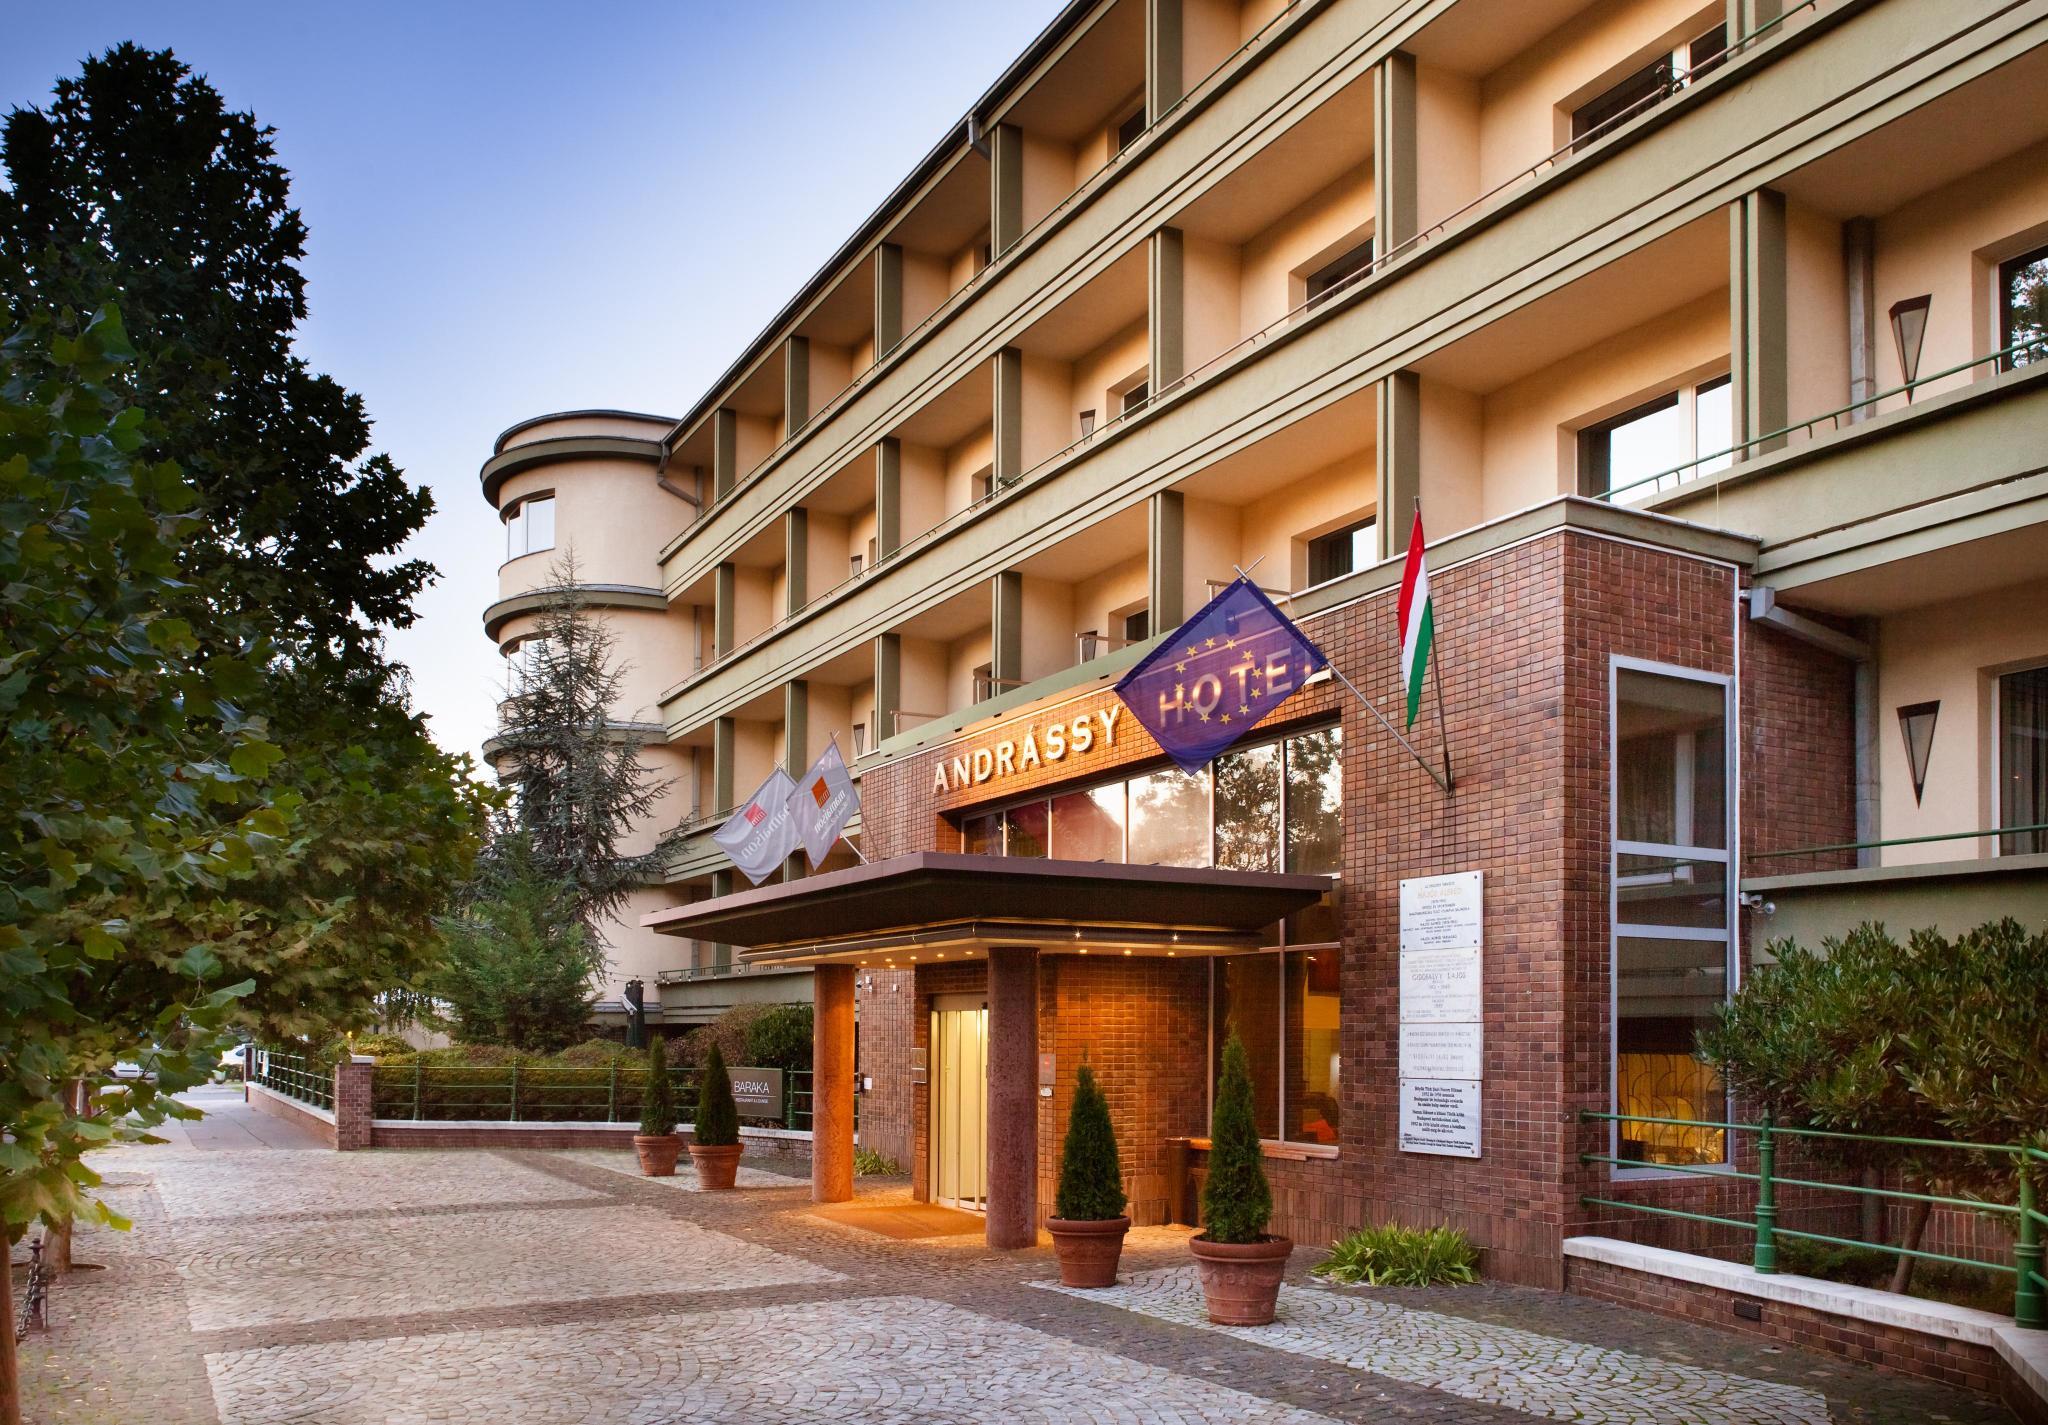 HotelMamaison Hotel Andrassy Budapest